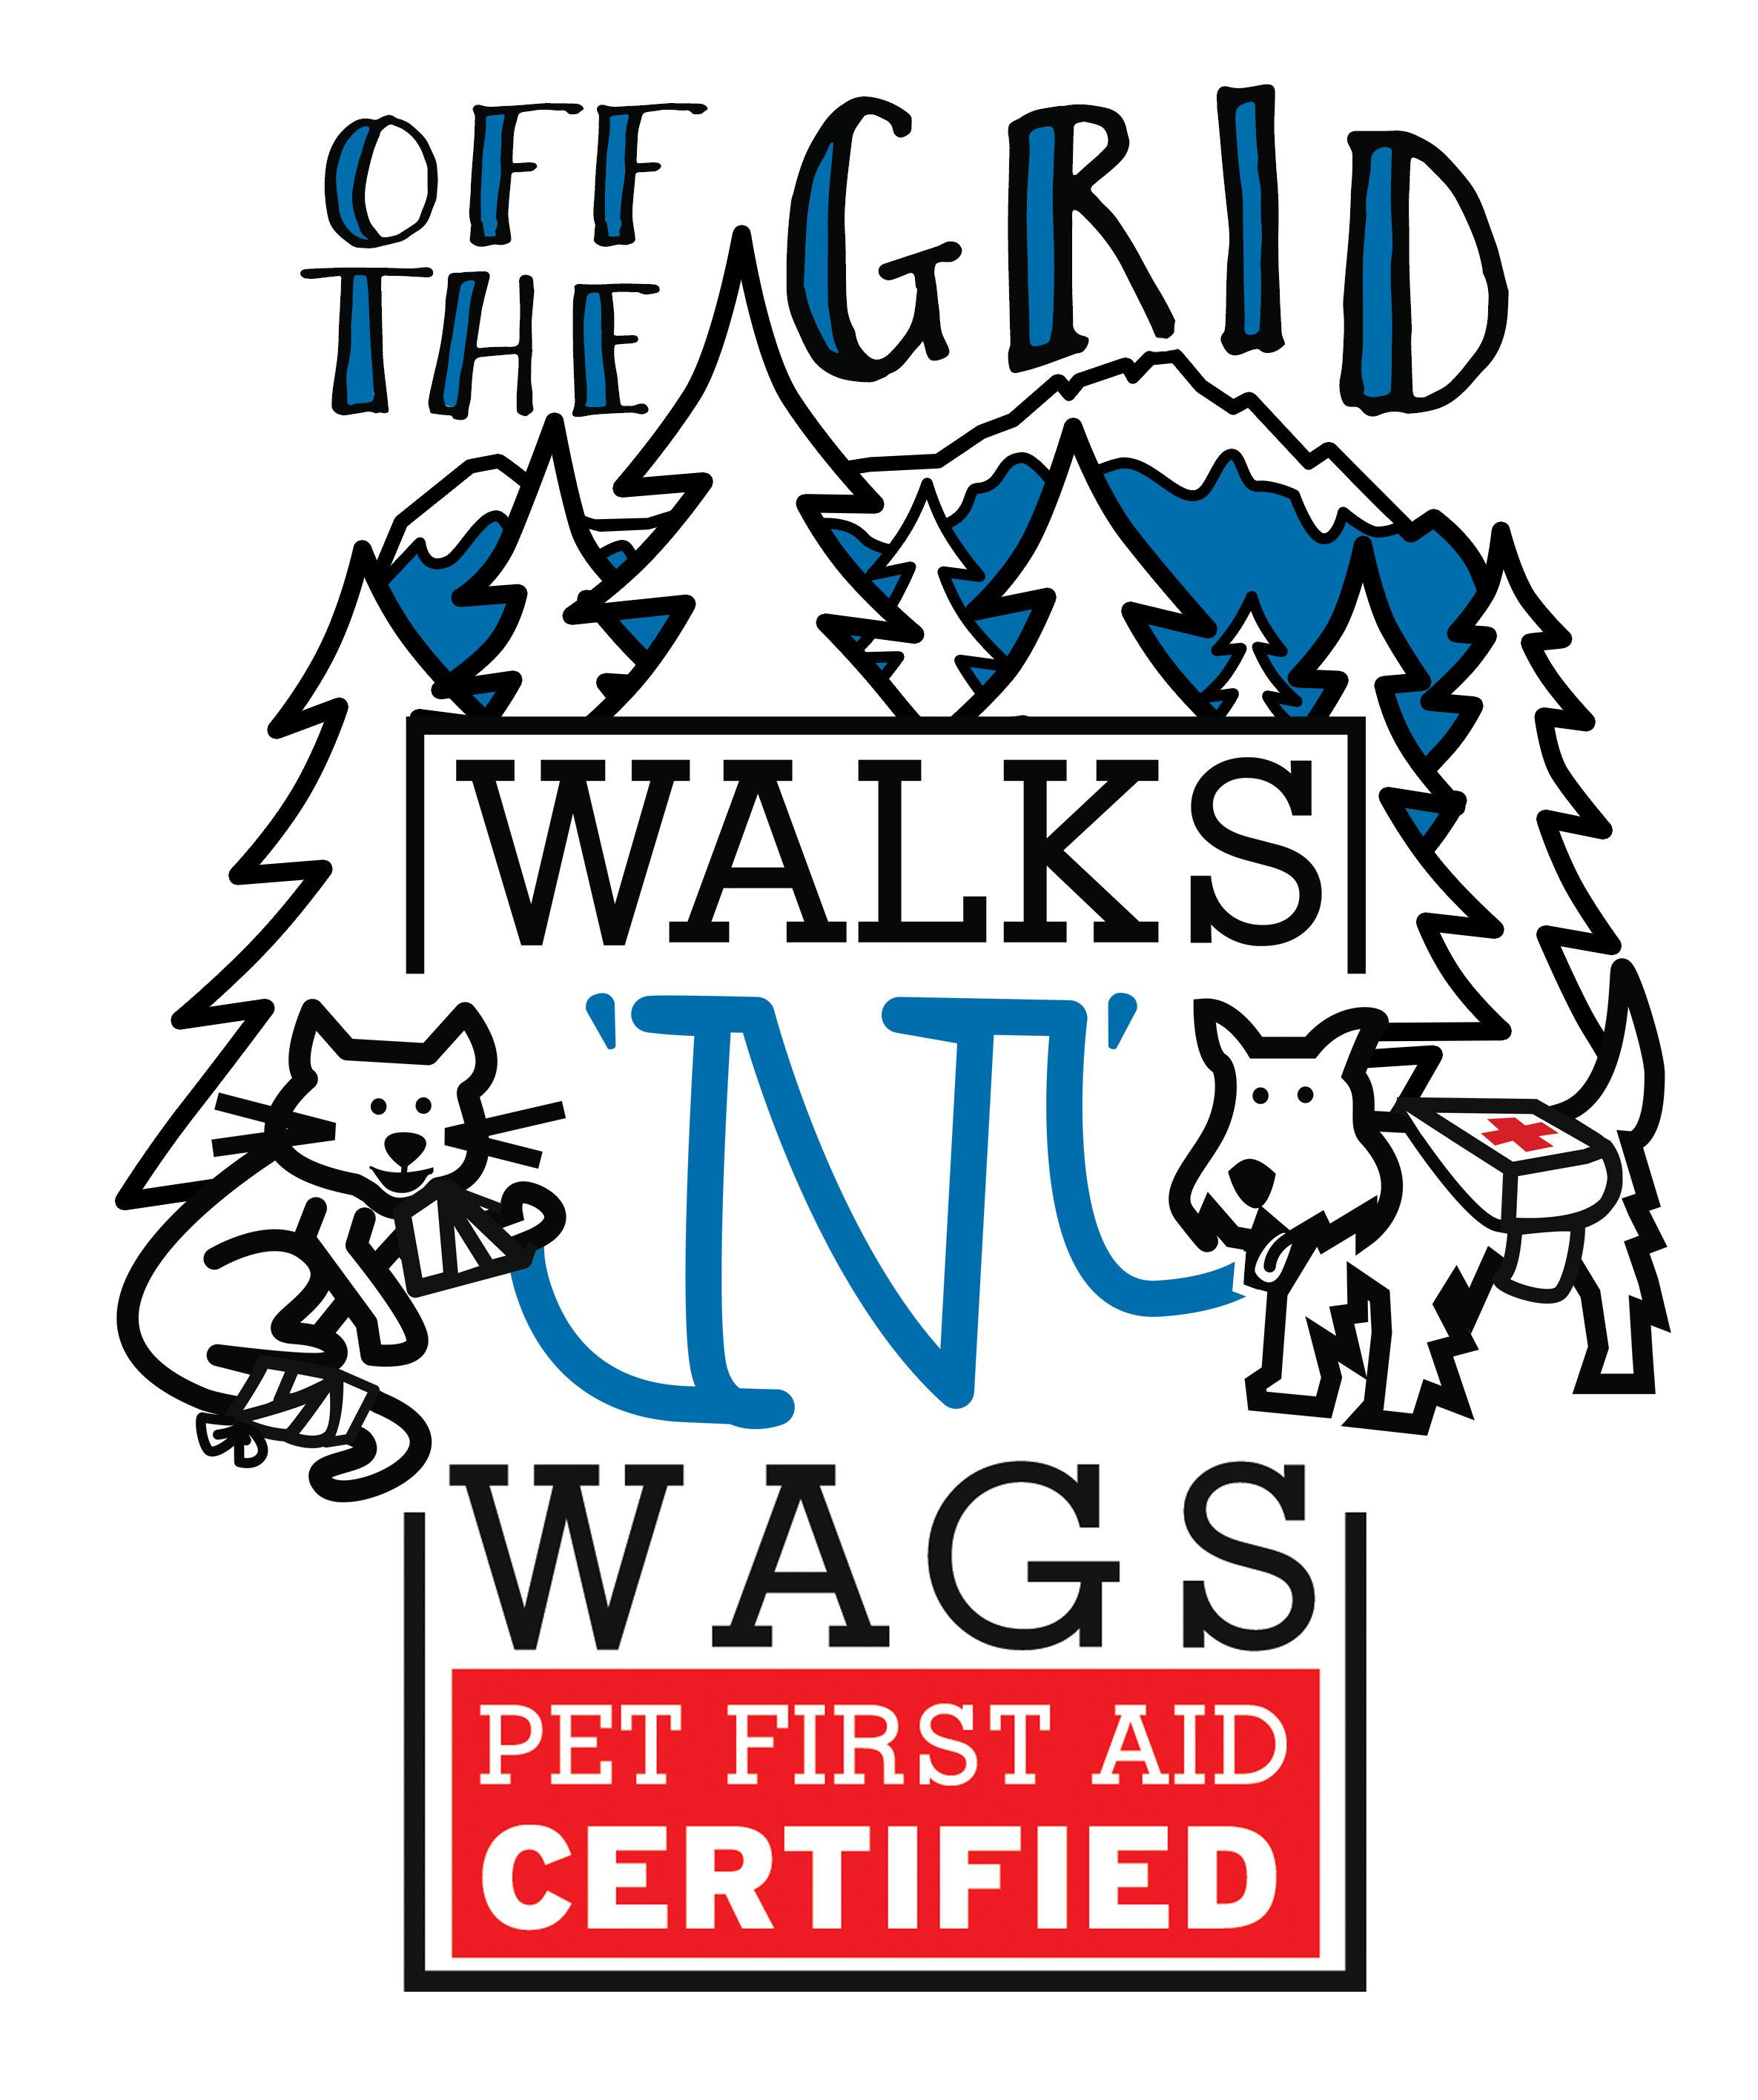 http://walksnwags.com